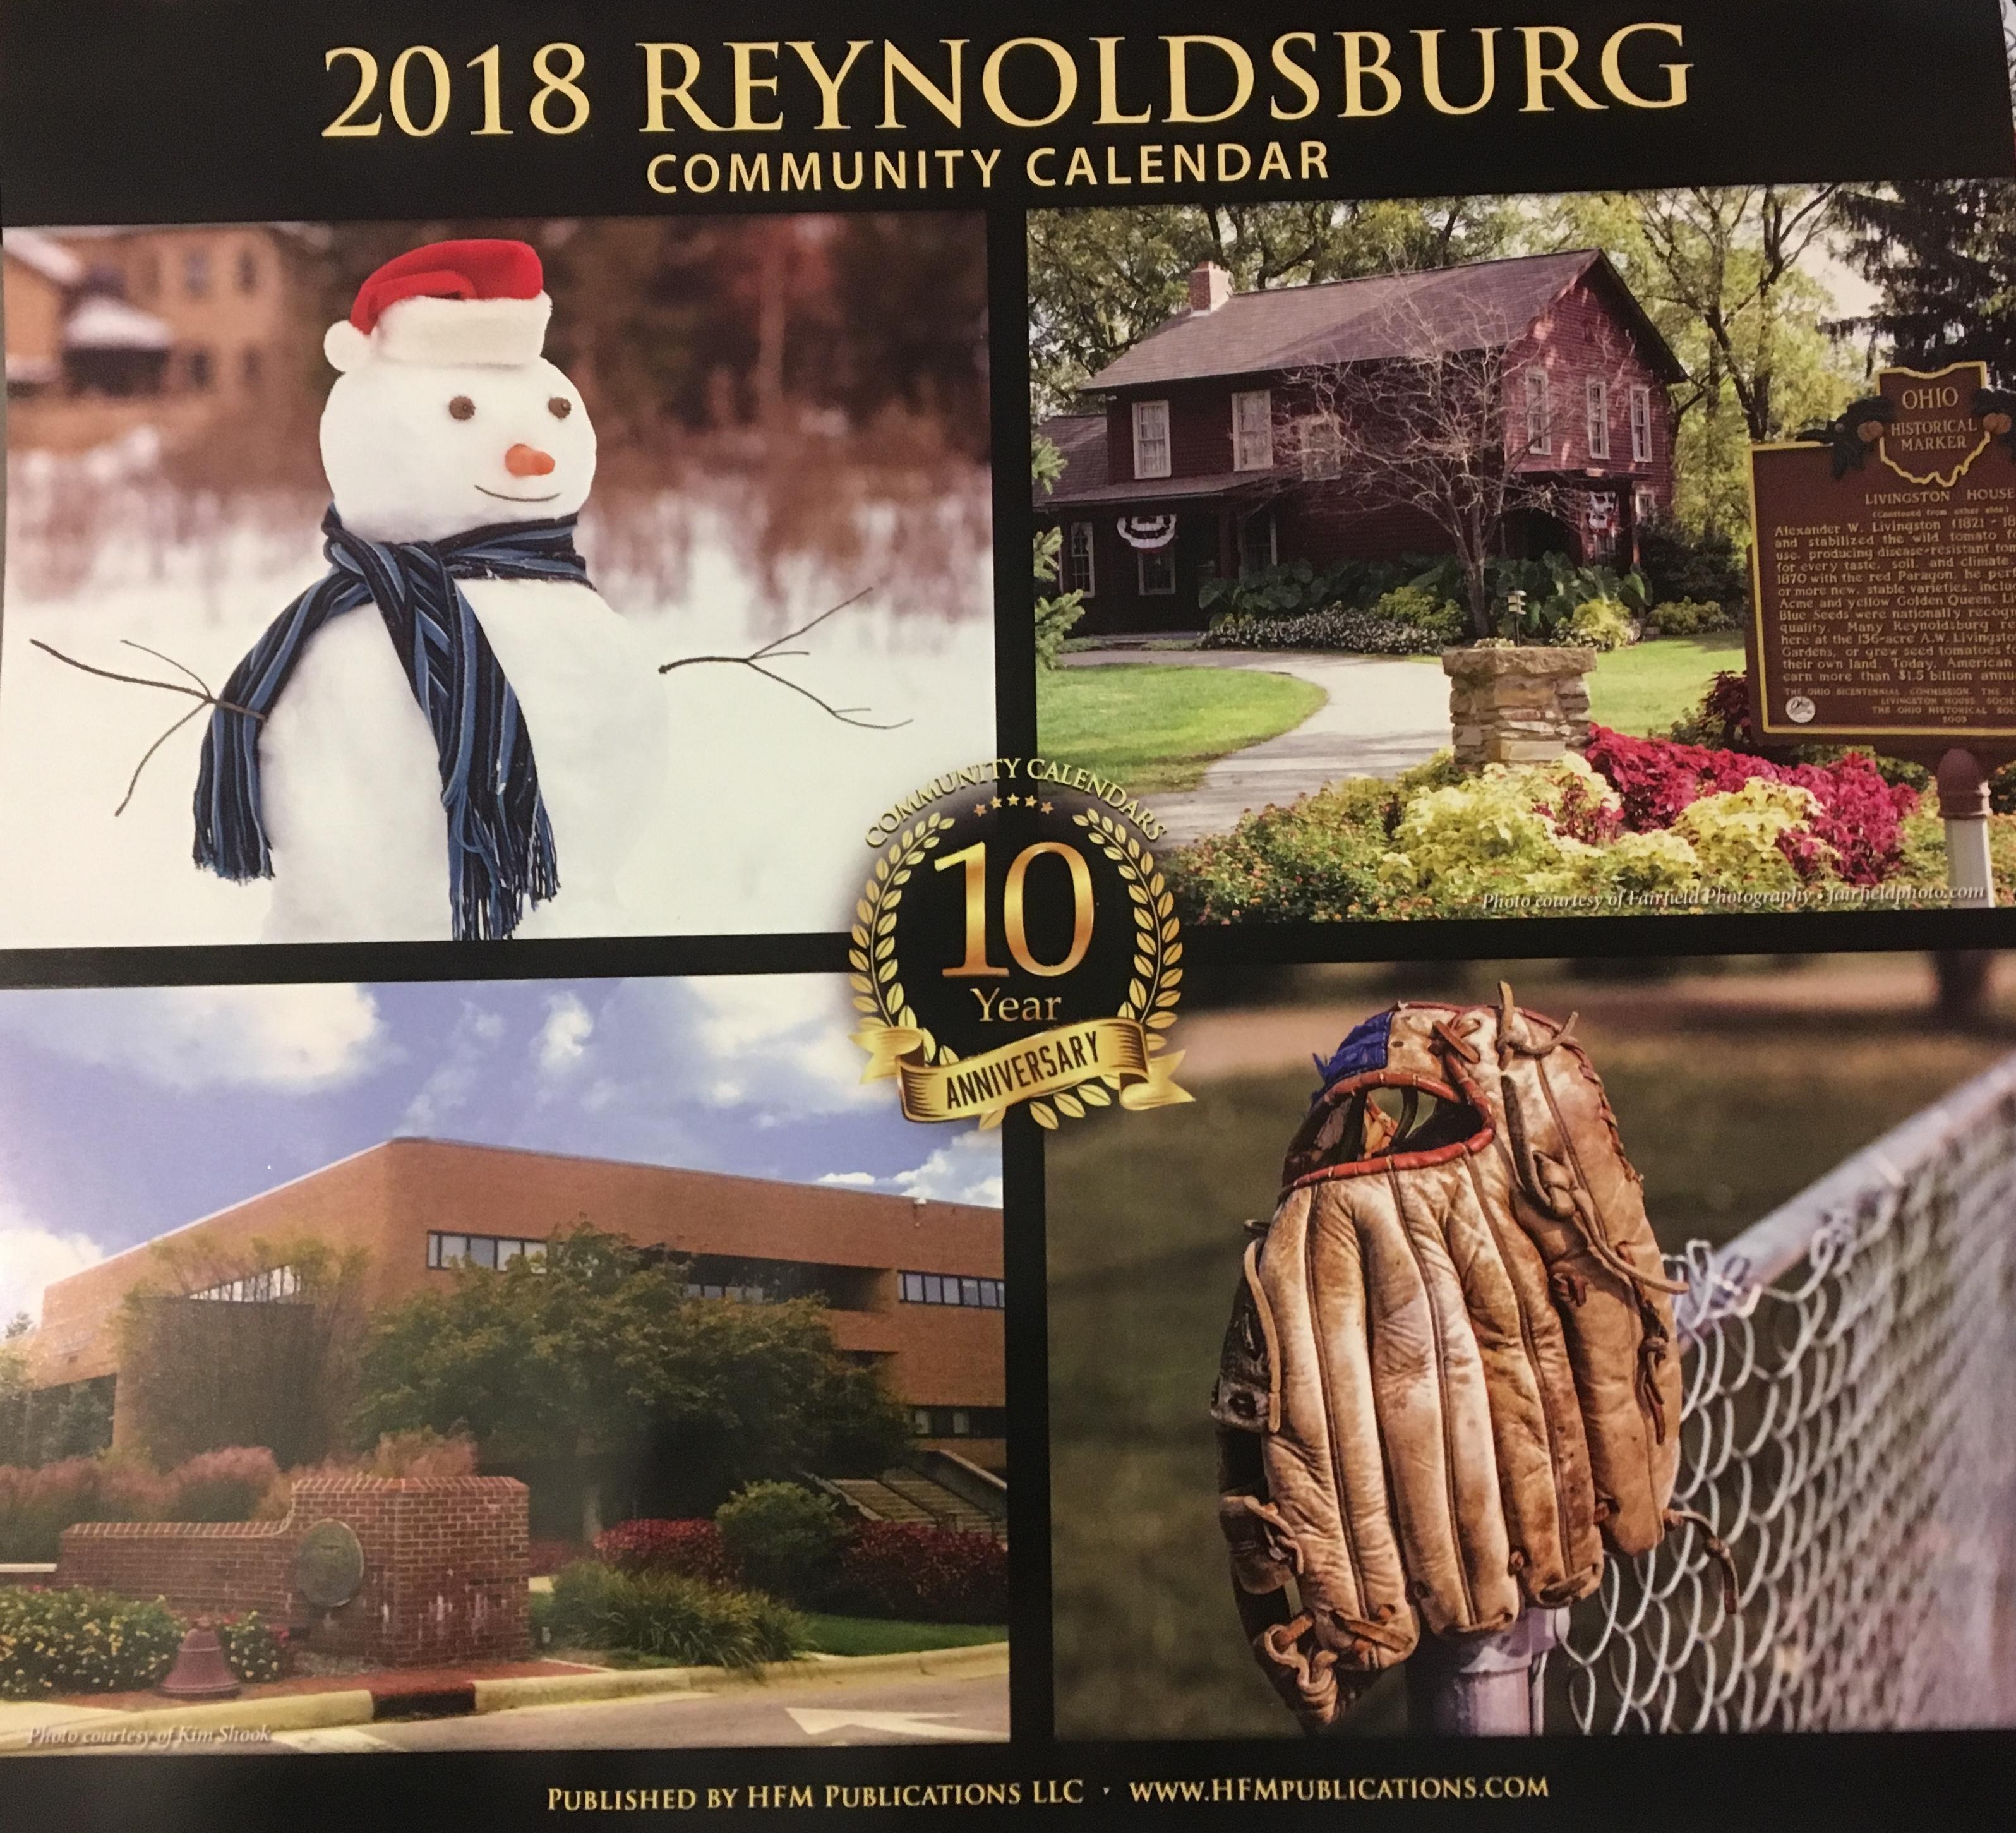 Reynoldsburg Community Calendar